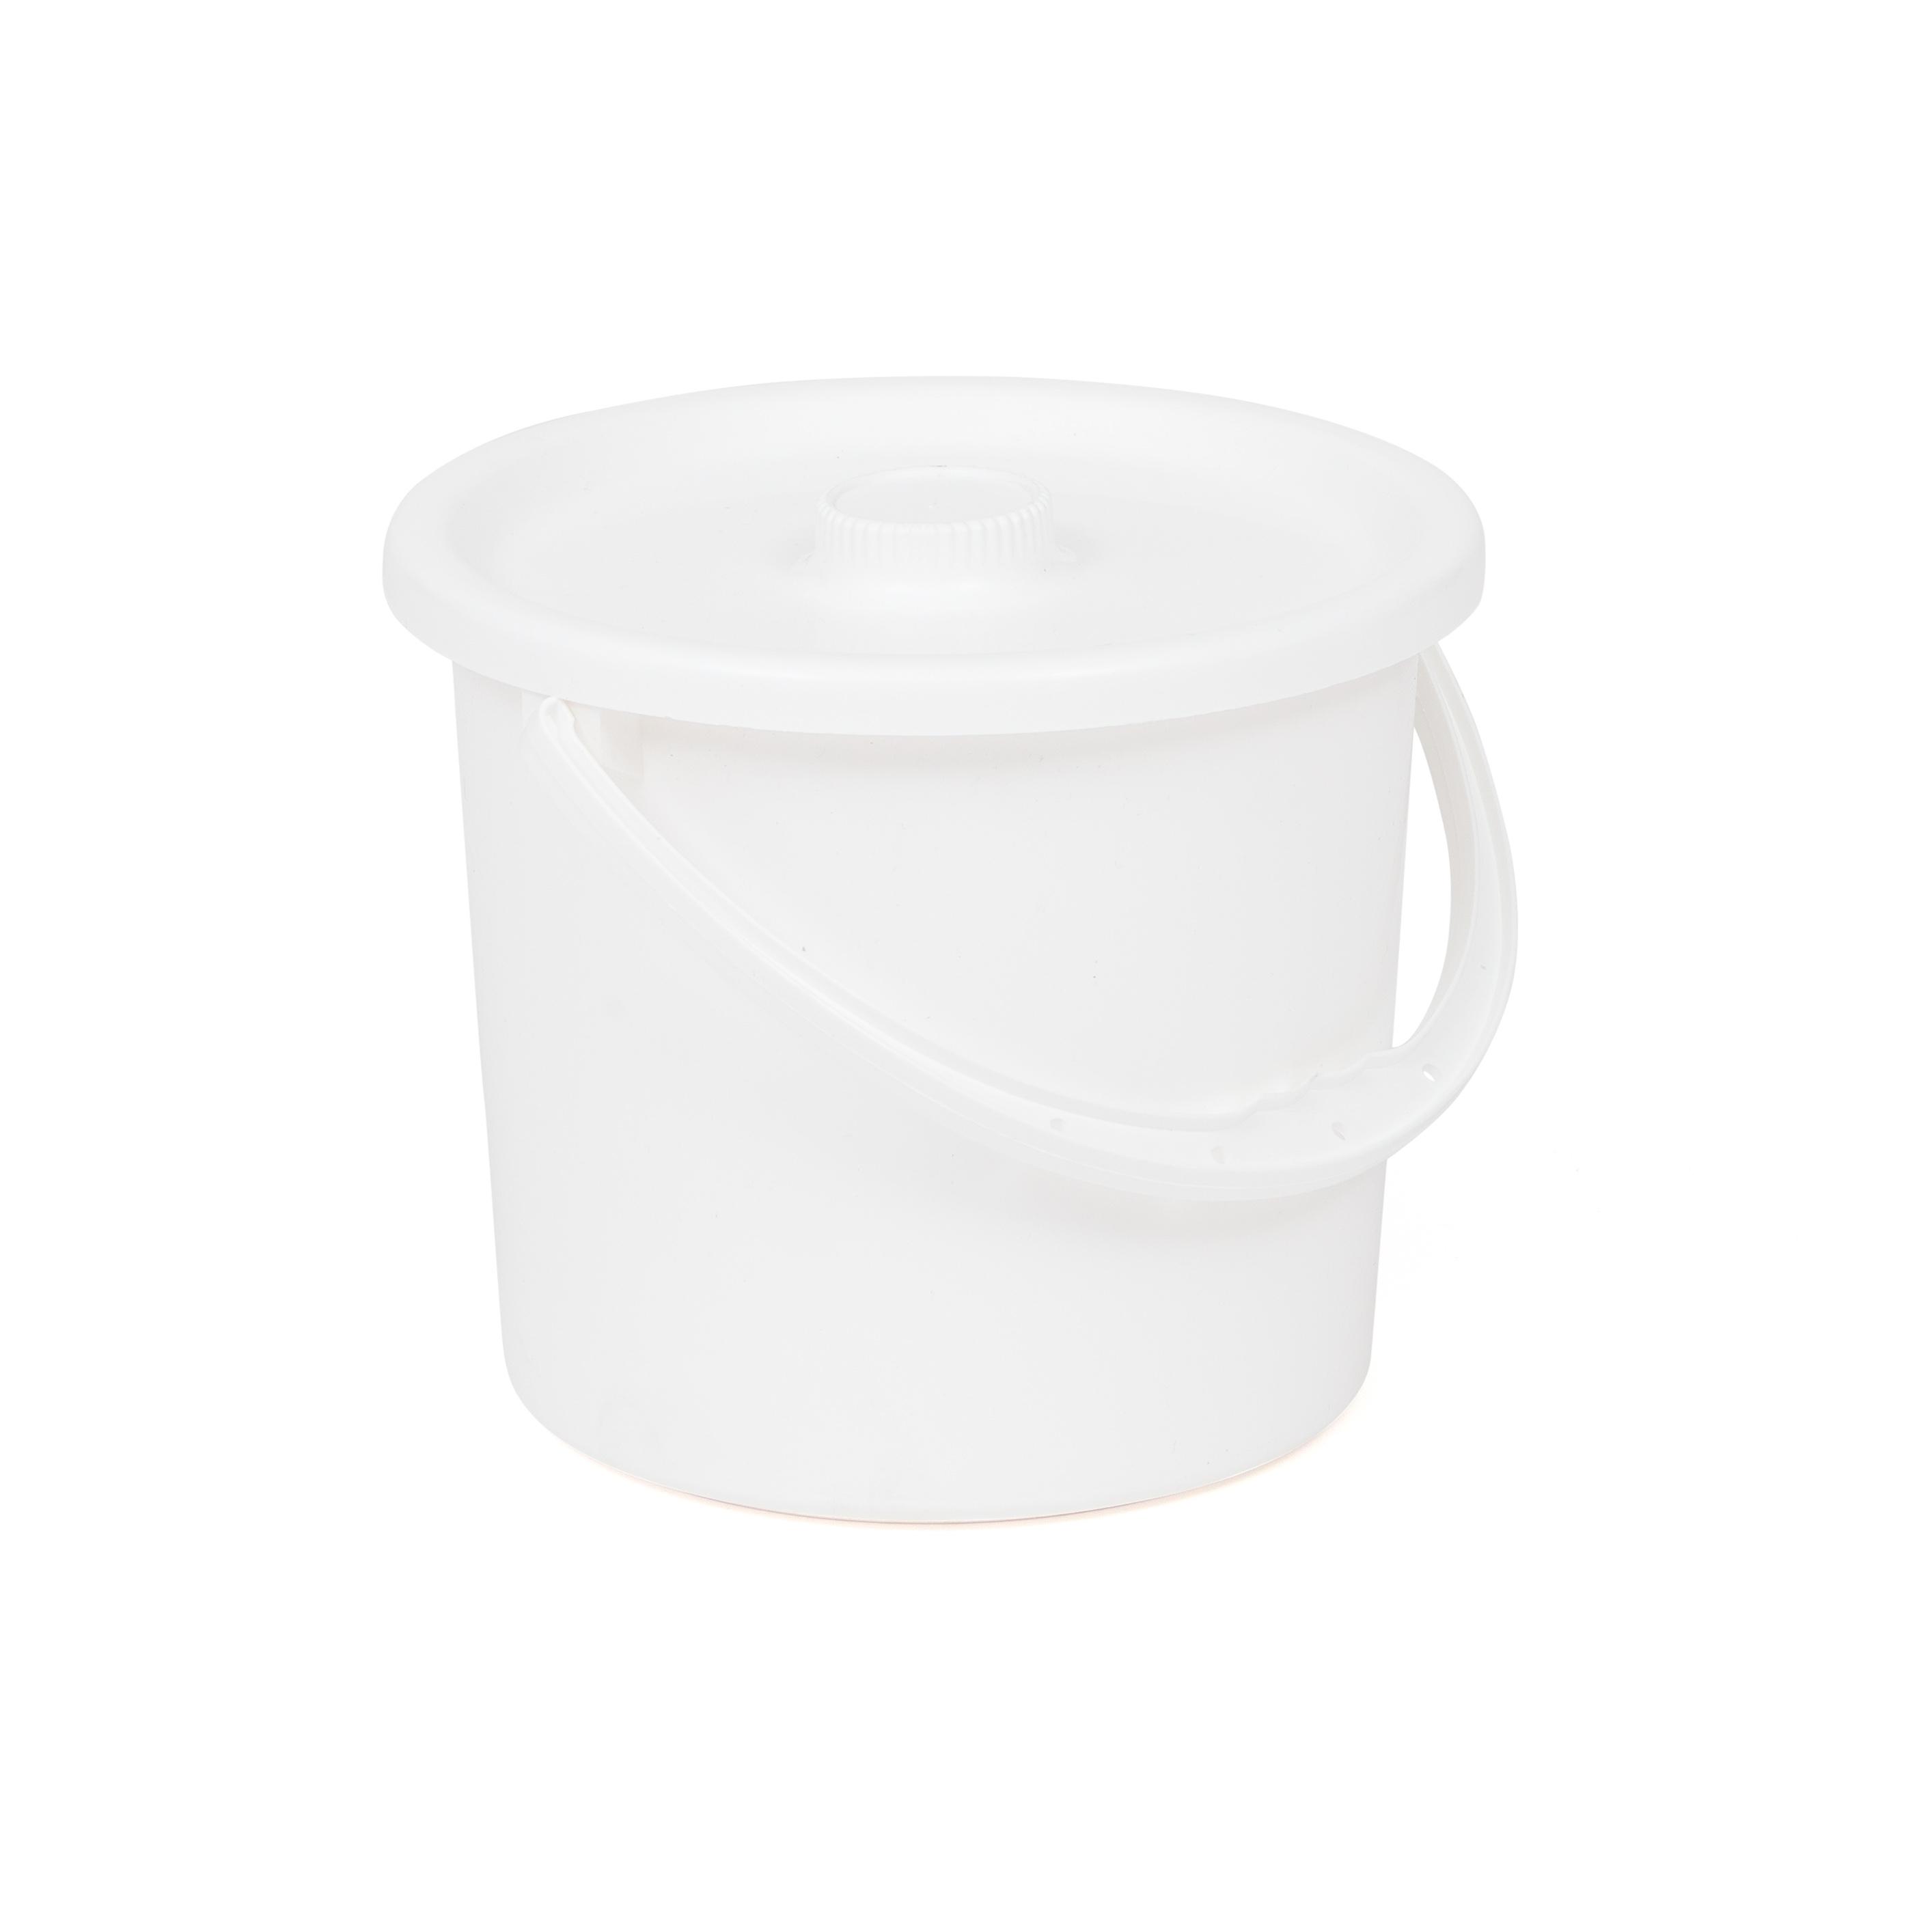 Bucket White 2.5L from Storage Box a22818409e5